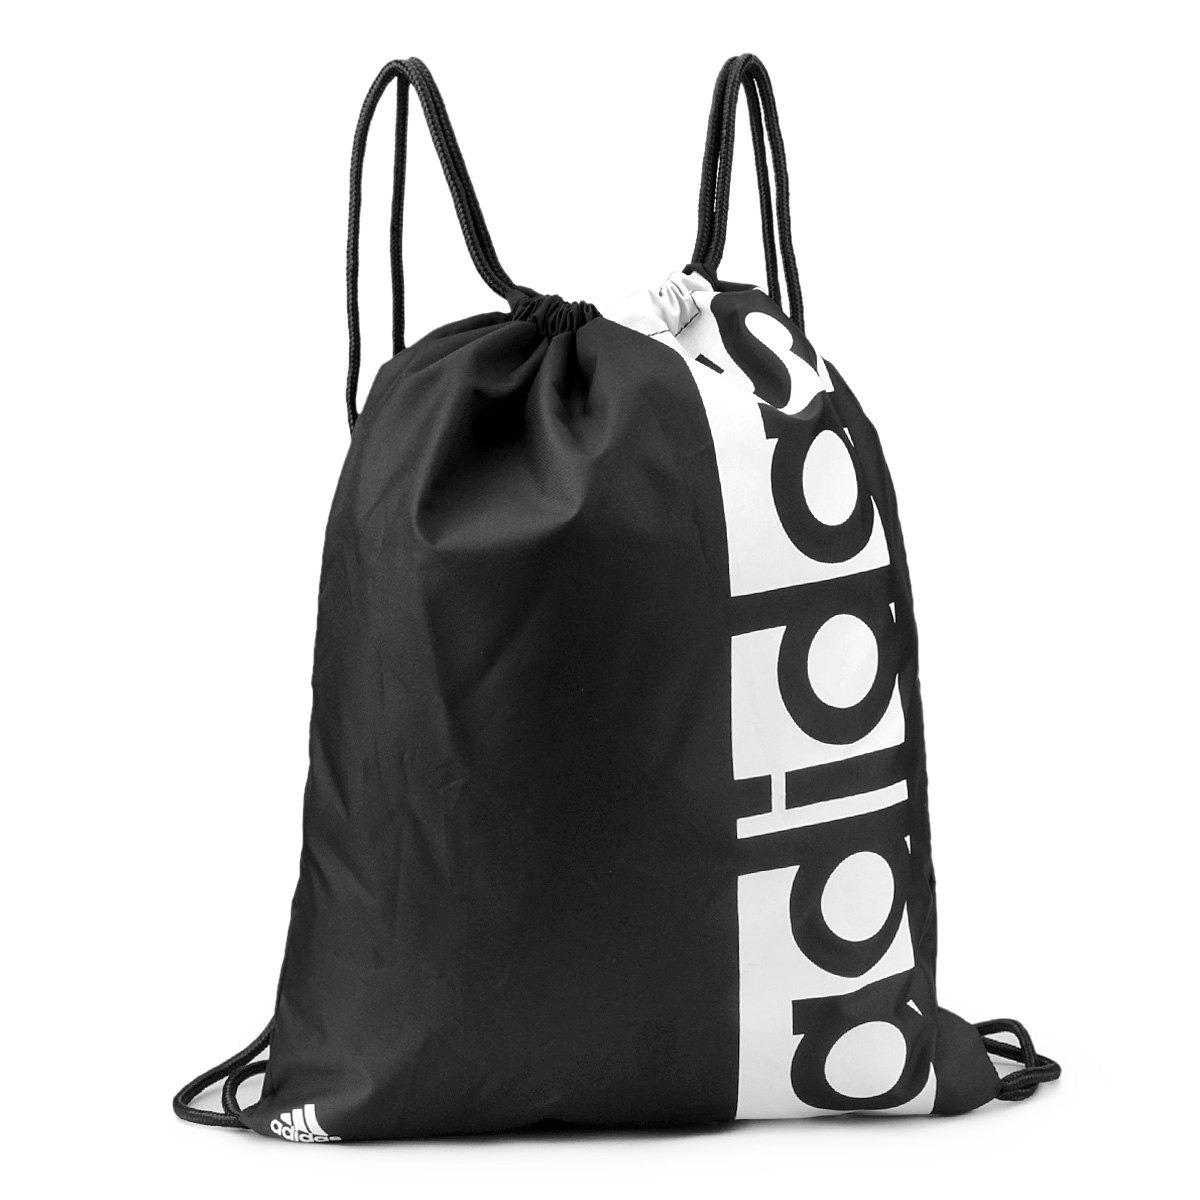 Sacola Adidas Performance Bolsa Bag Gym Linear ulK1cJF3T